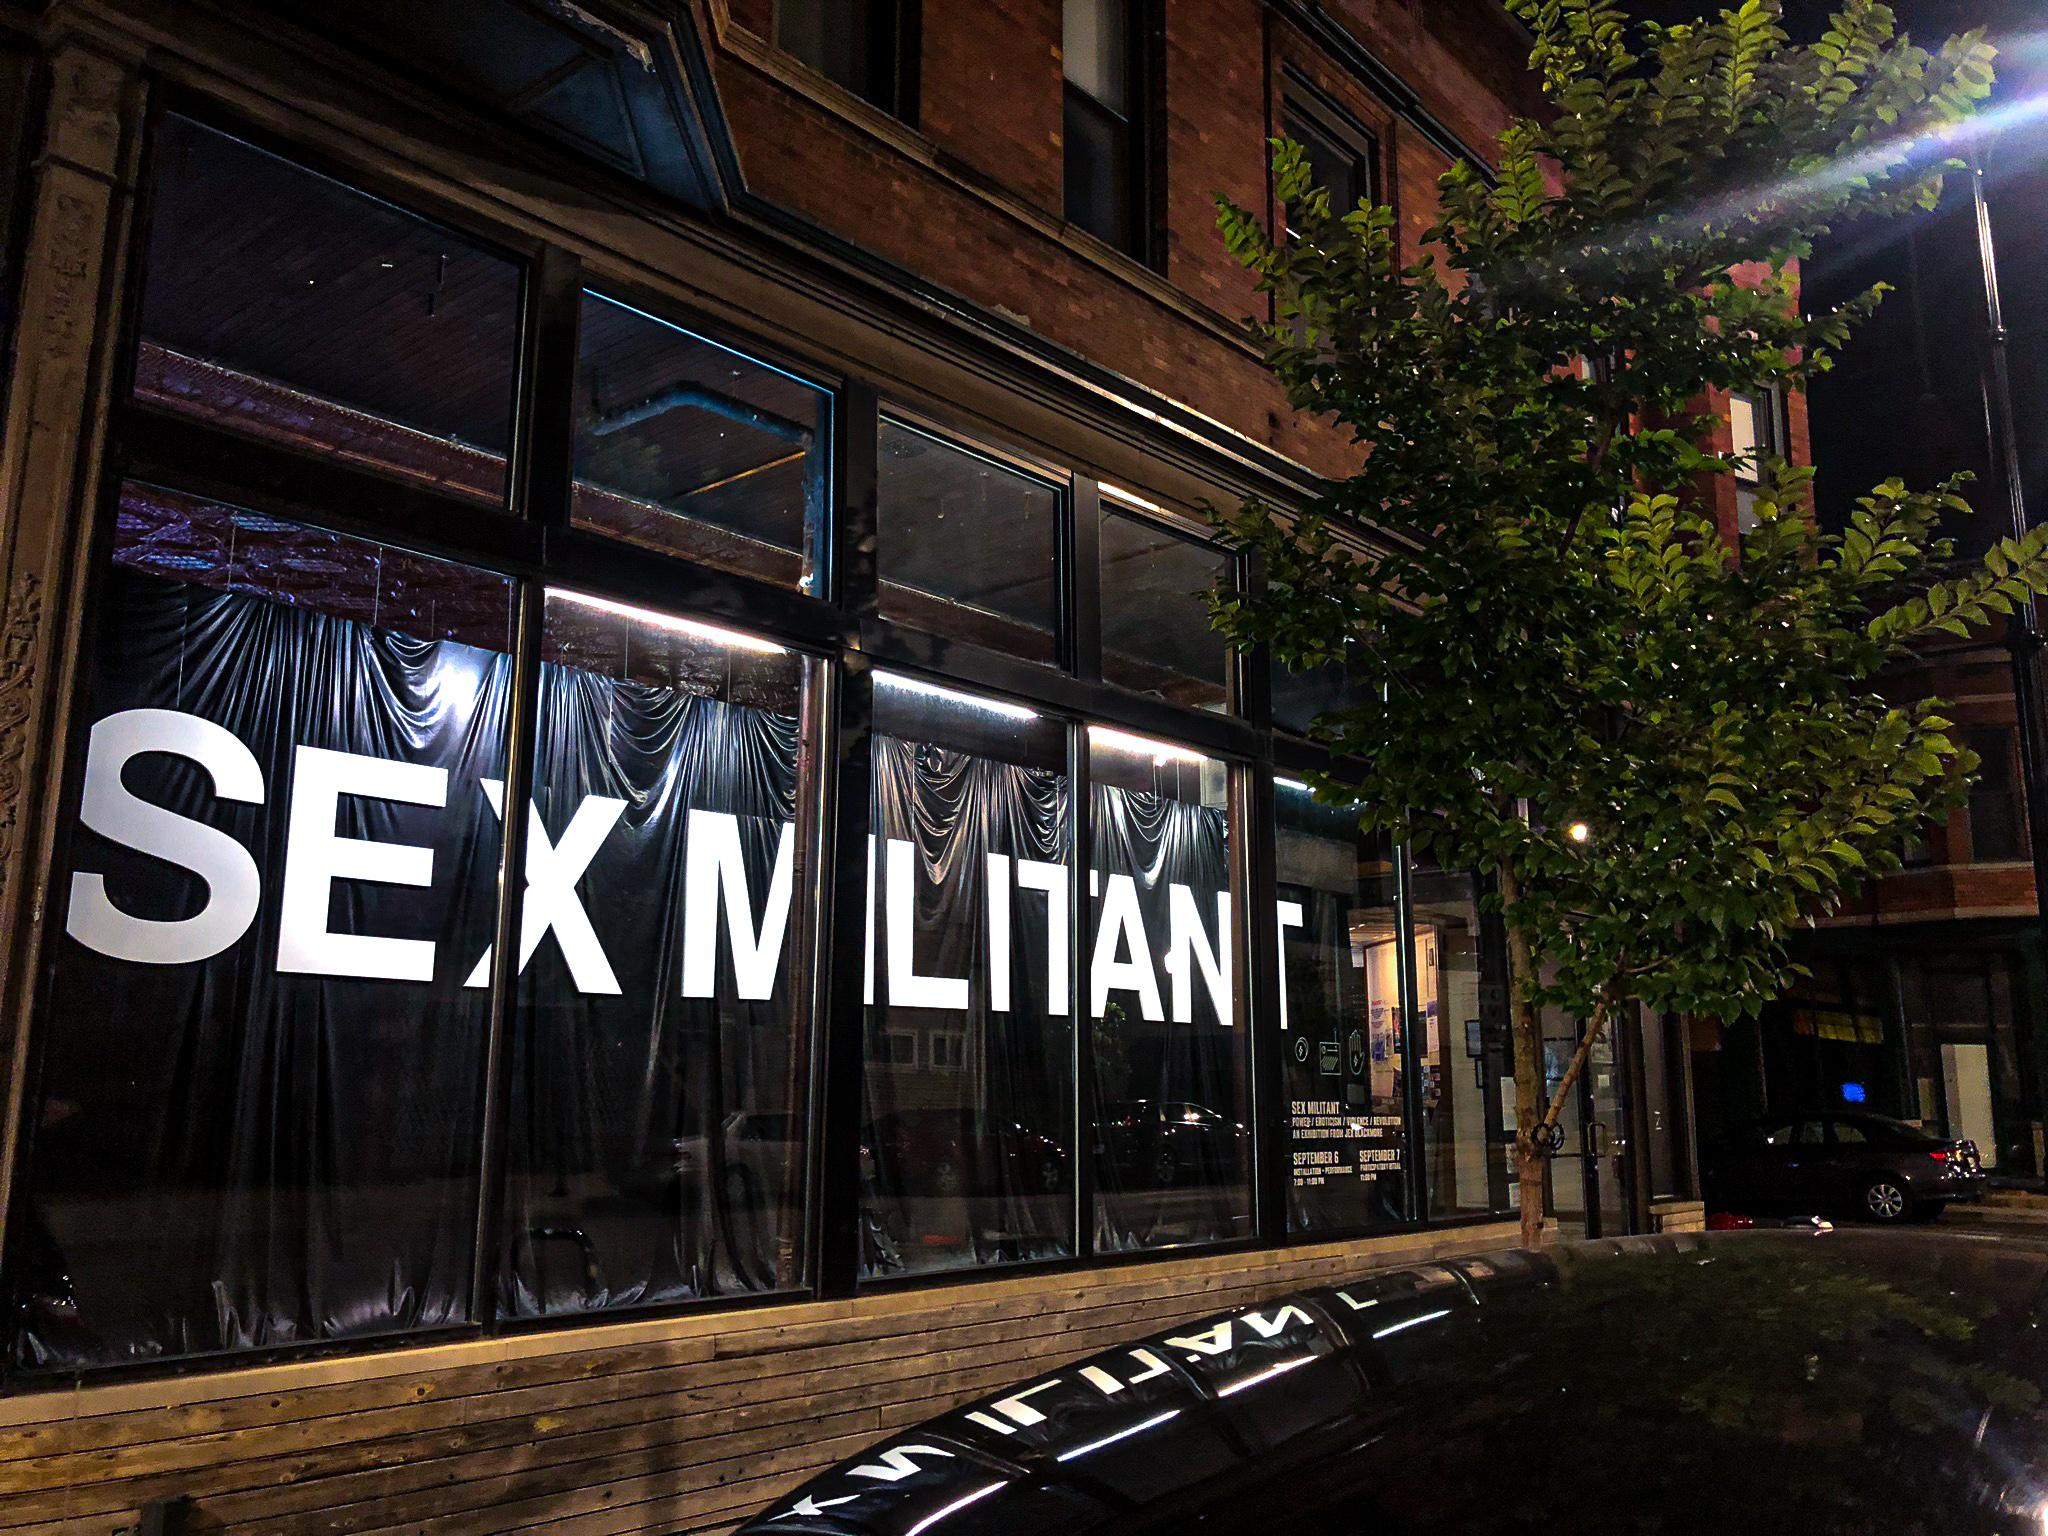 Exhibition Window Display